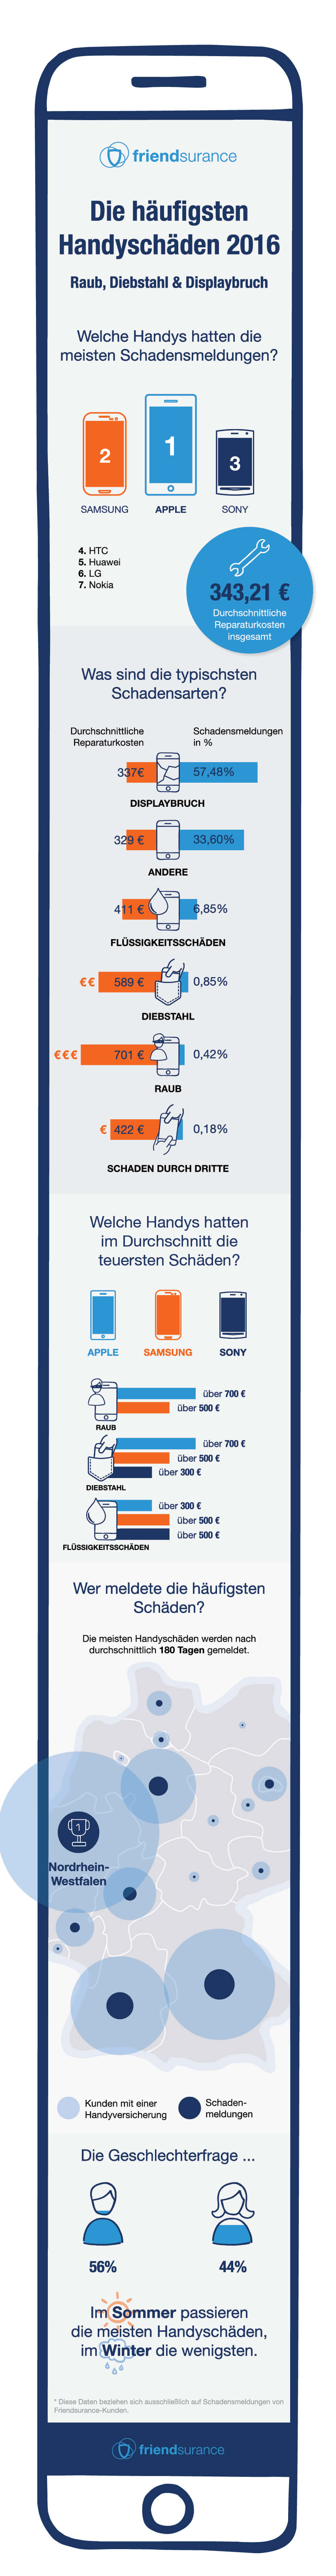 Handyschäden: Am Häufigsten Geht Das Display Kaputt | Friendsurance